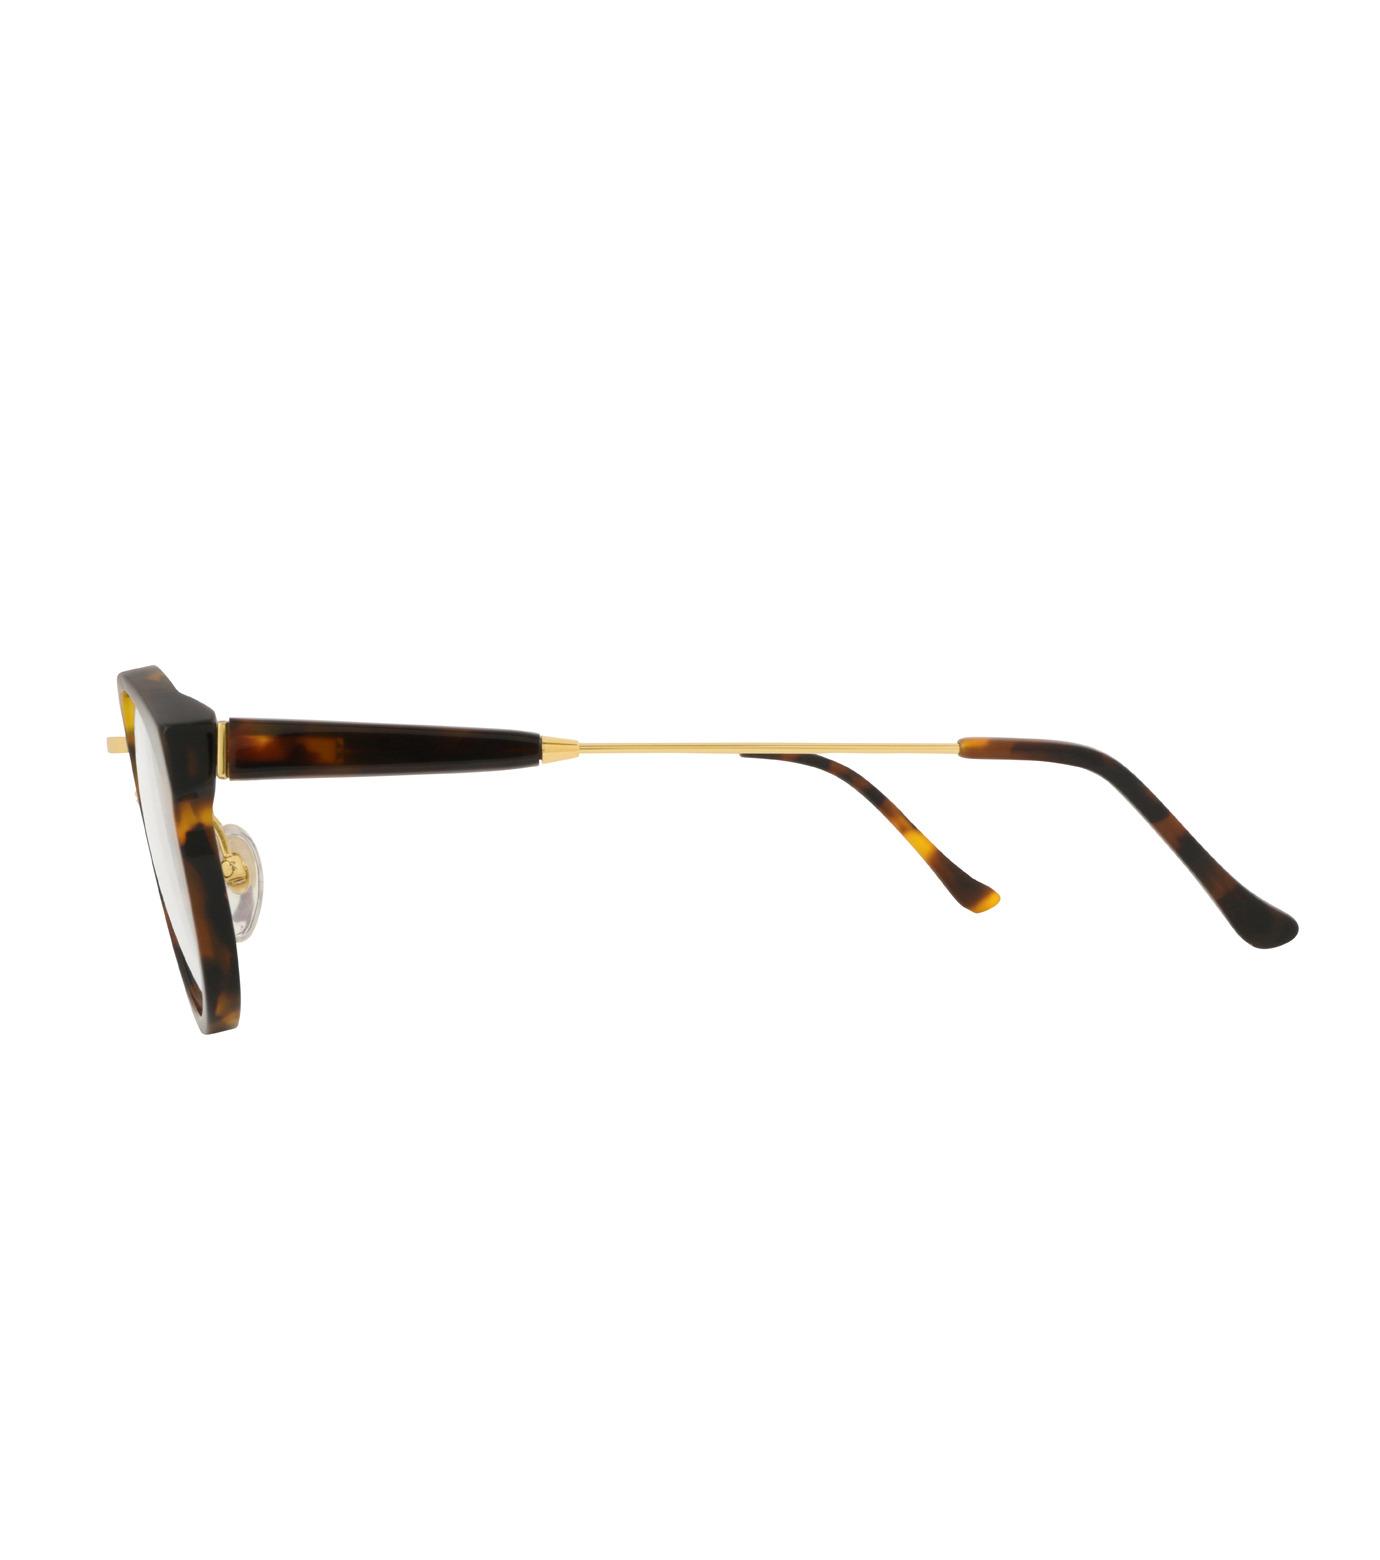 SUPER(スーパー)のPANAMA HAVANA CLASSIC CLEAR LENS-BROWN(アイウェア/eyewear)-SPRXXXX055-42 拡大詳細画像2